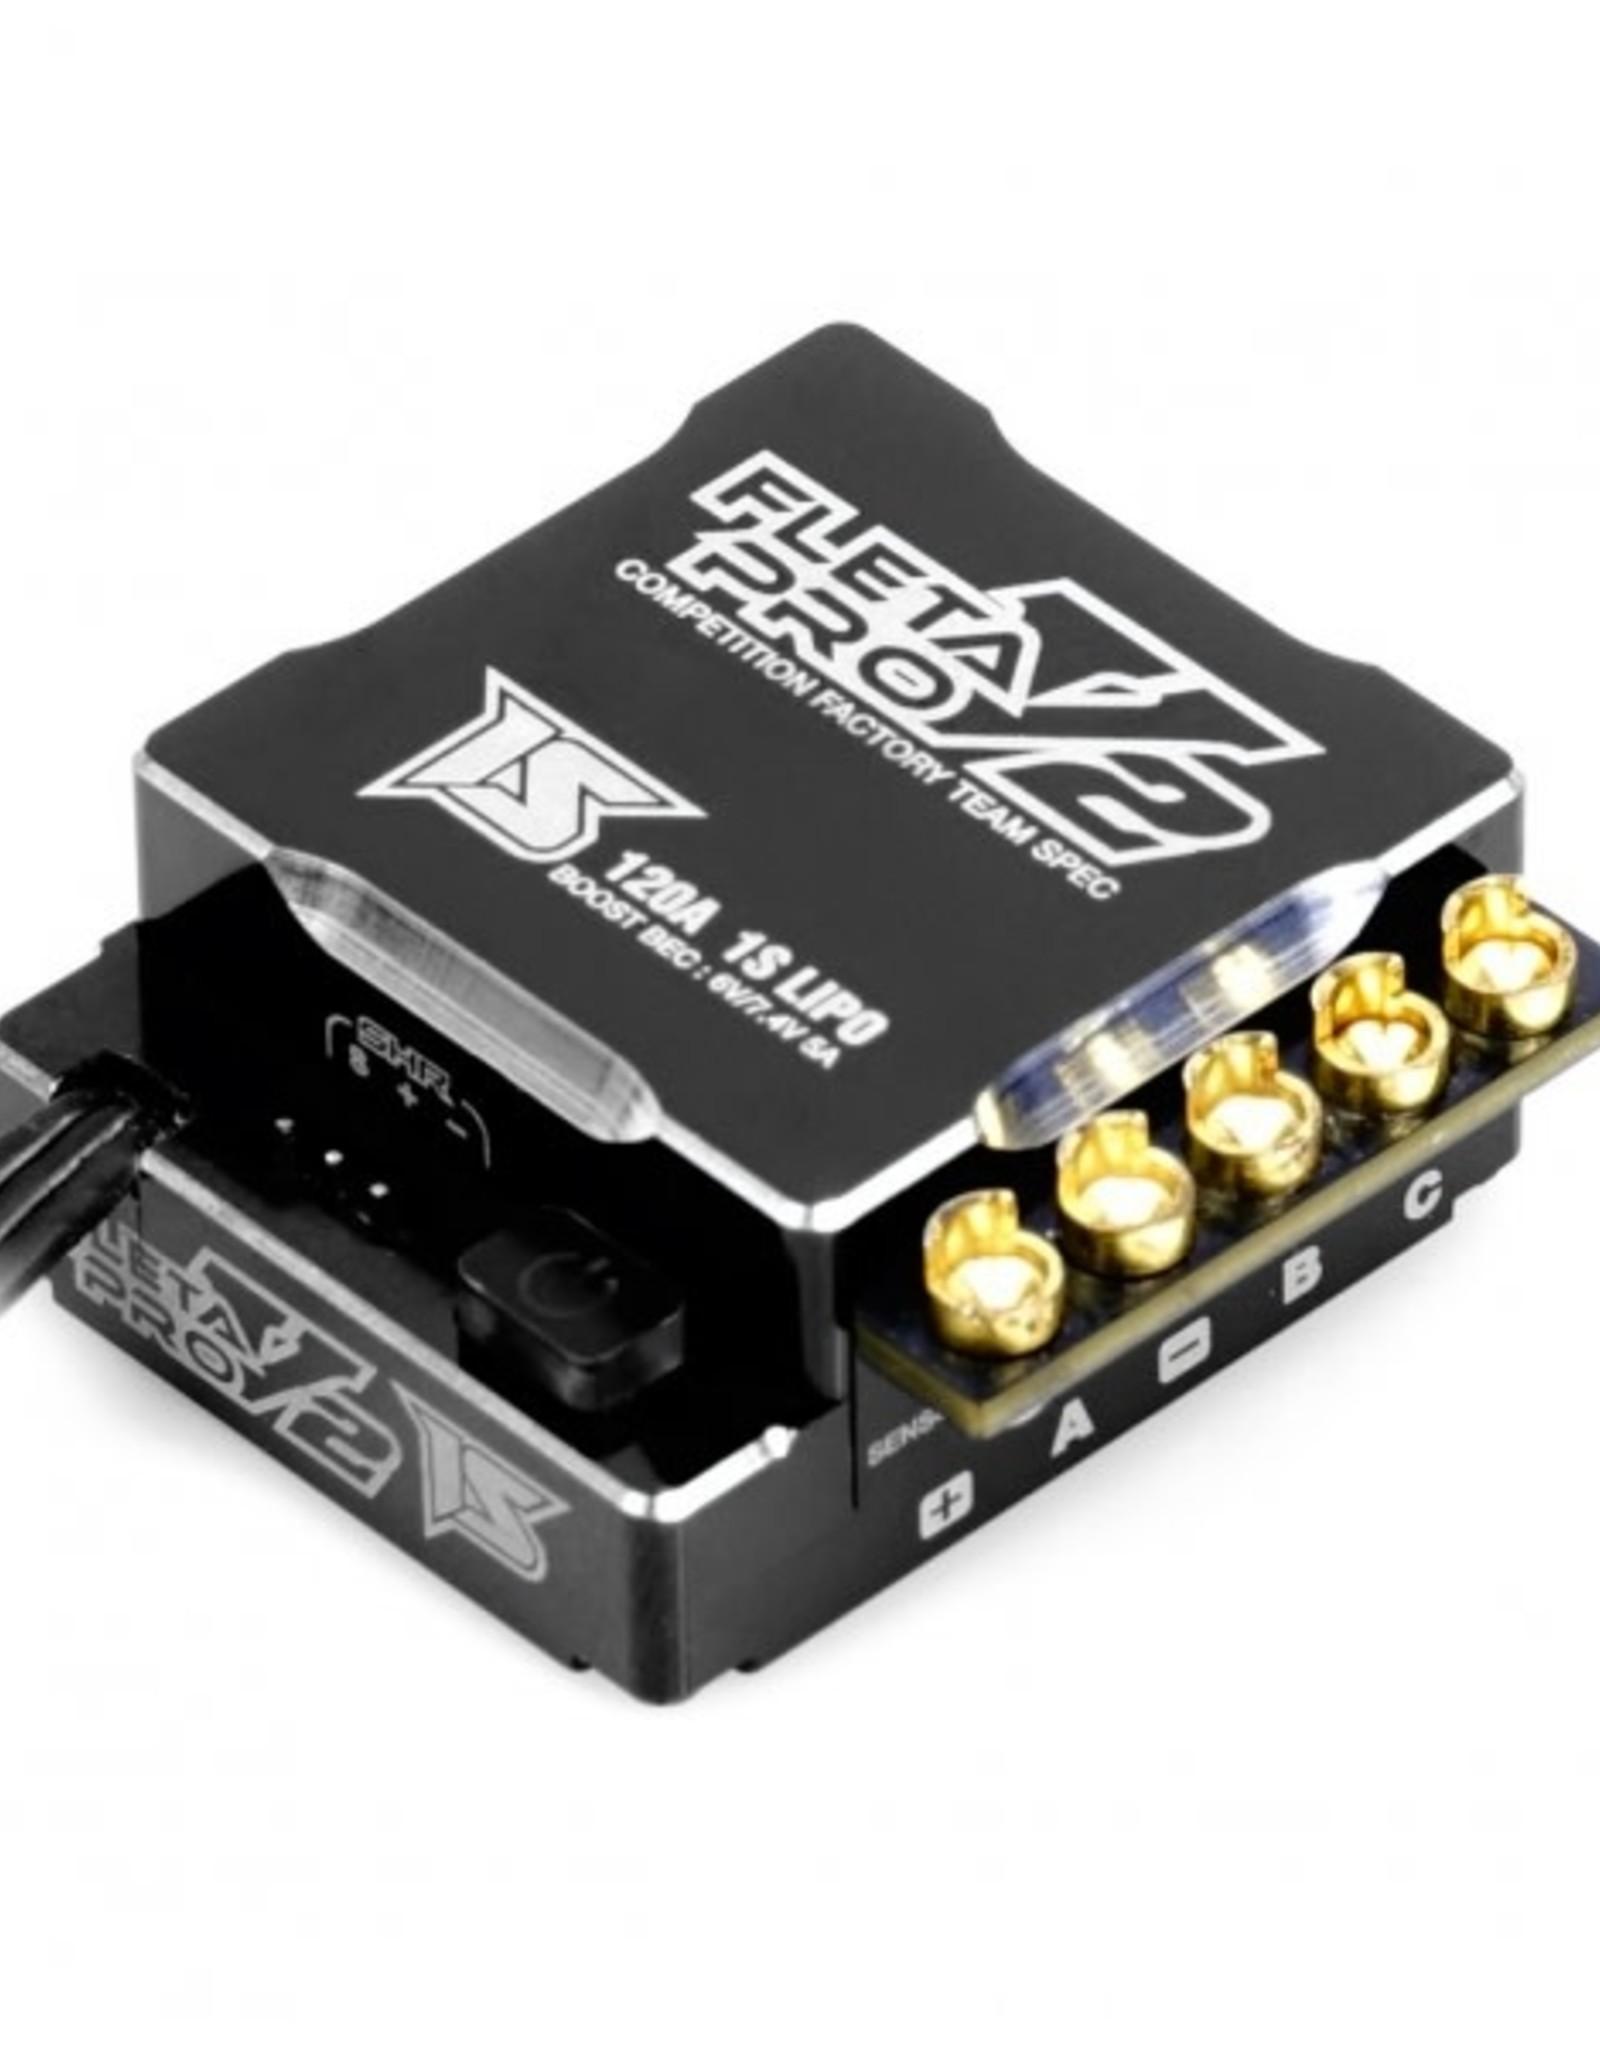 Muchmore Muchmore FLETA PRO V2 1S Brushless ESC Black